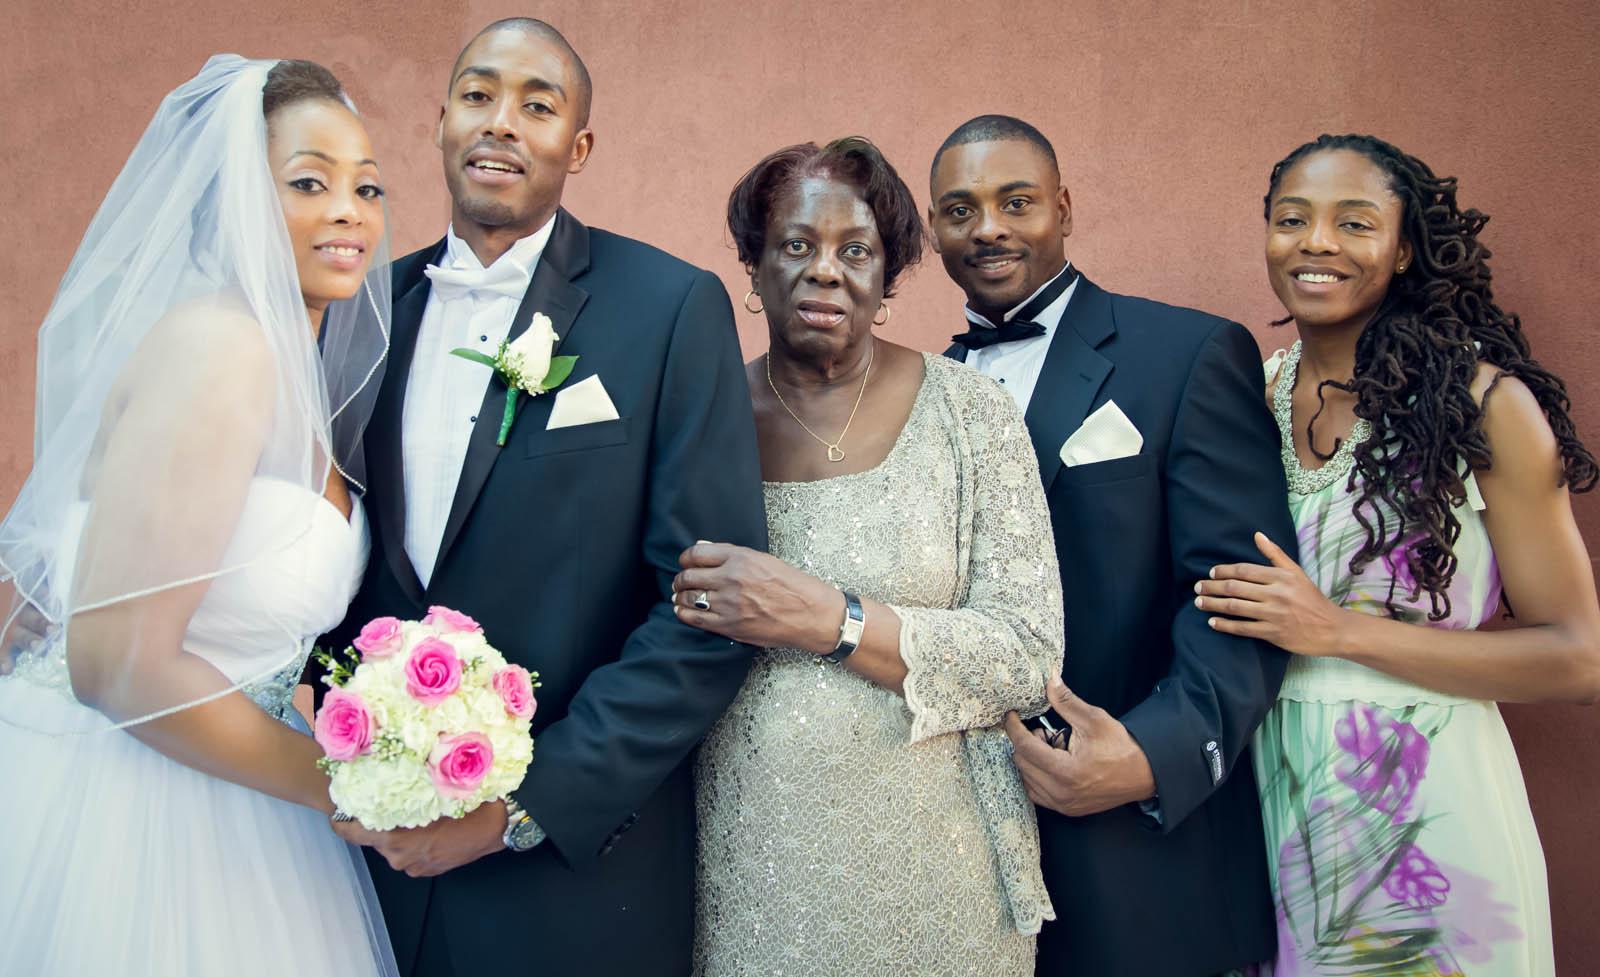 Malik_and_Shanika_Wedding_Ernestosue-9143-Edit.jpg